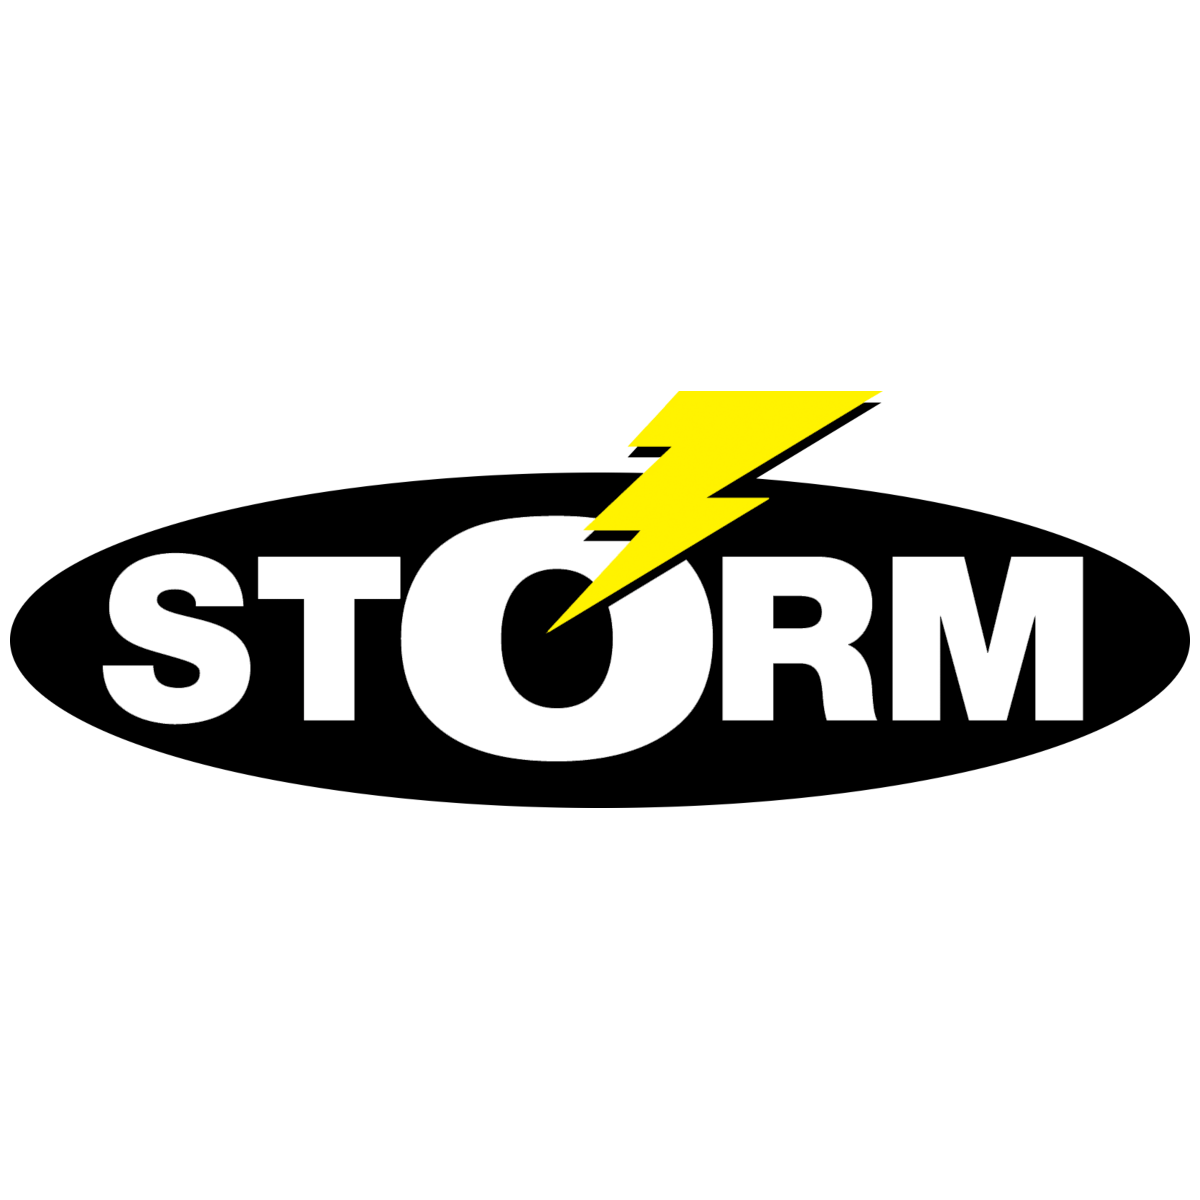 Storm Fishing Baits